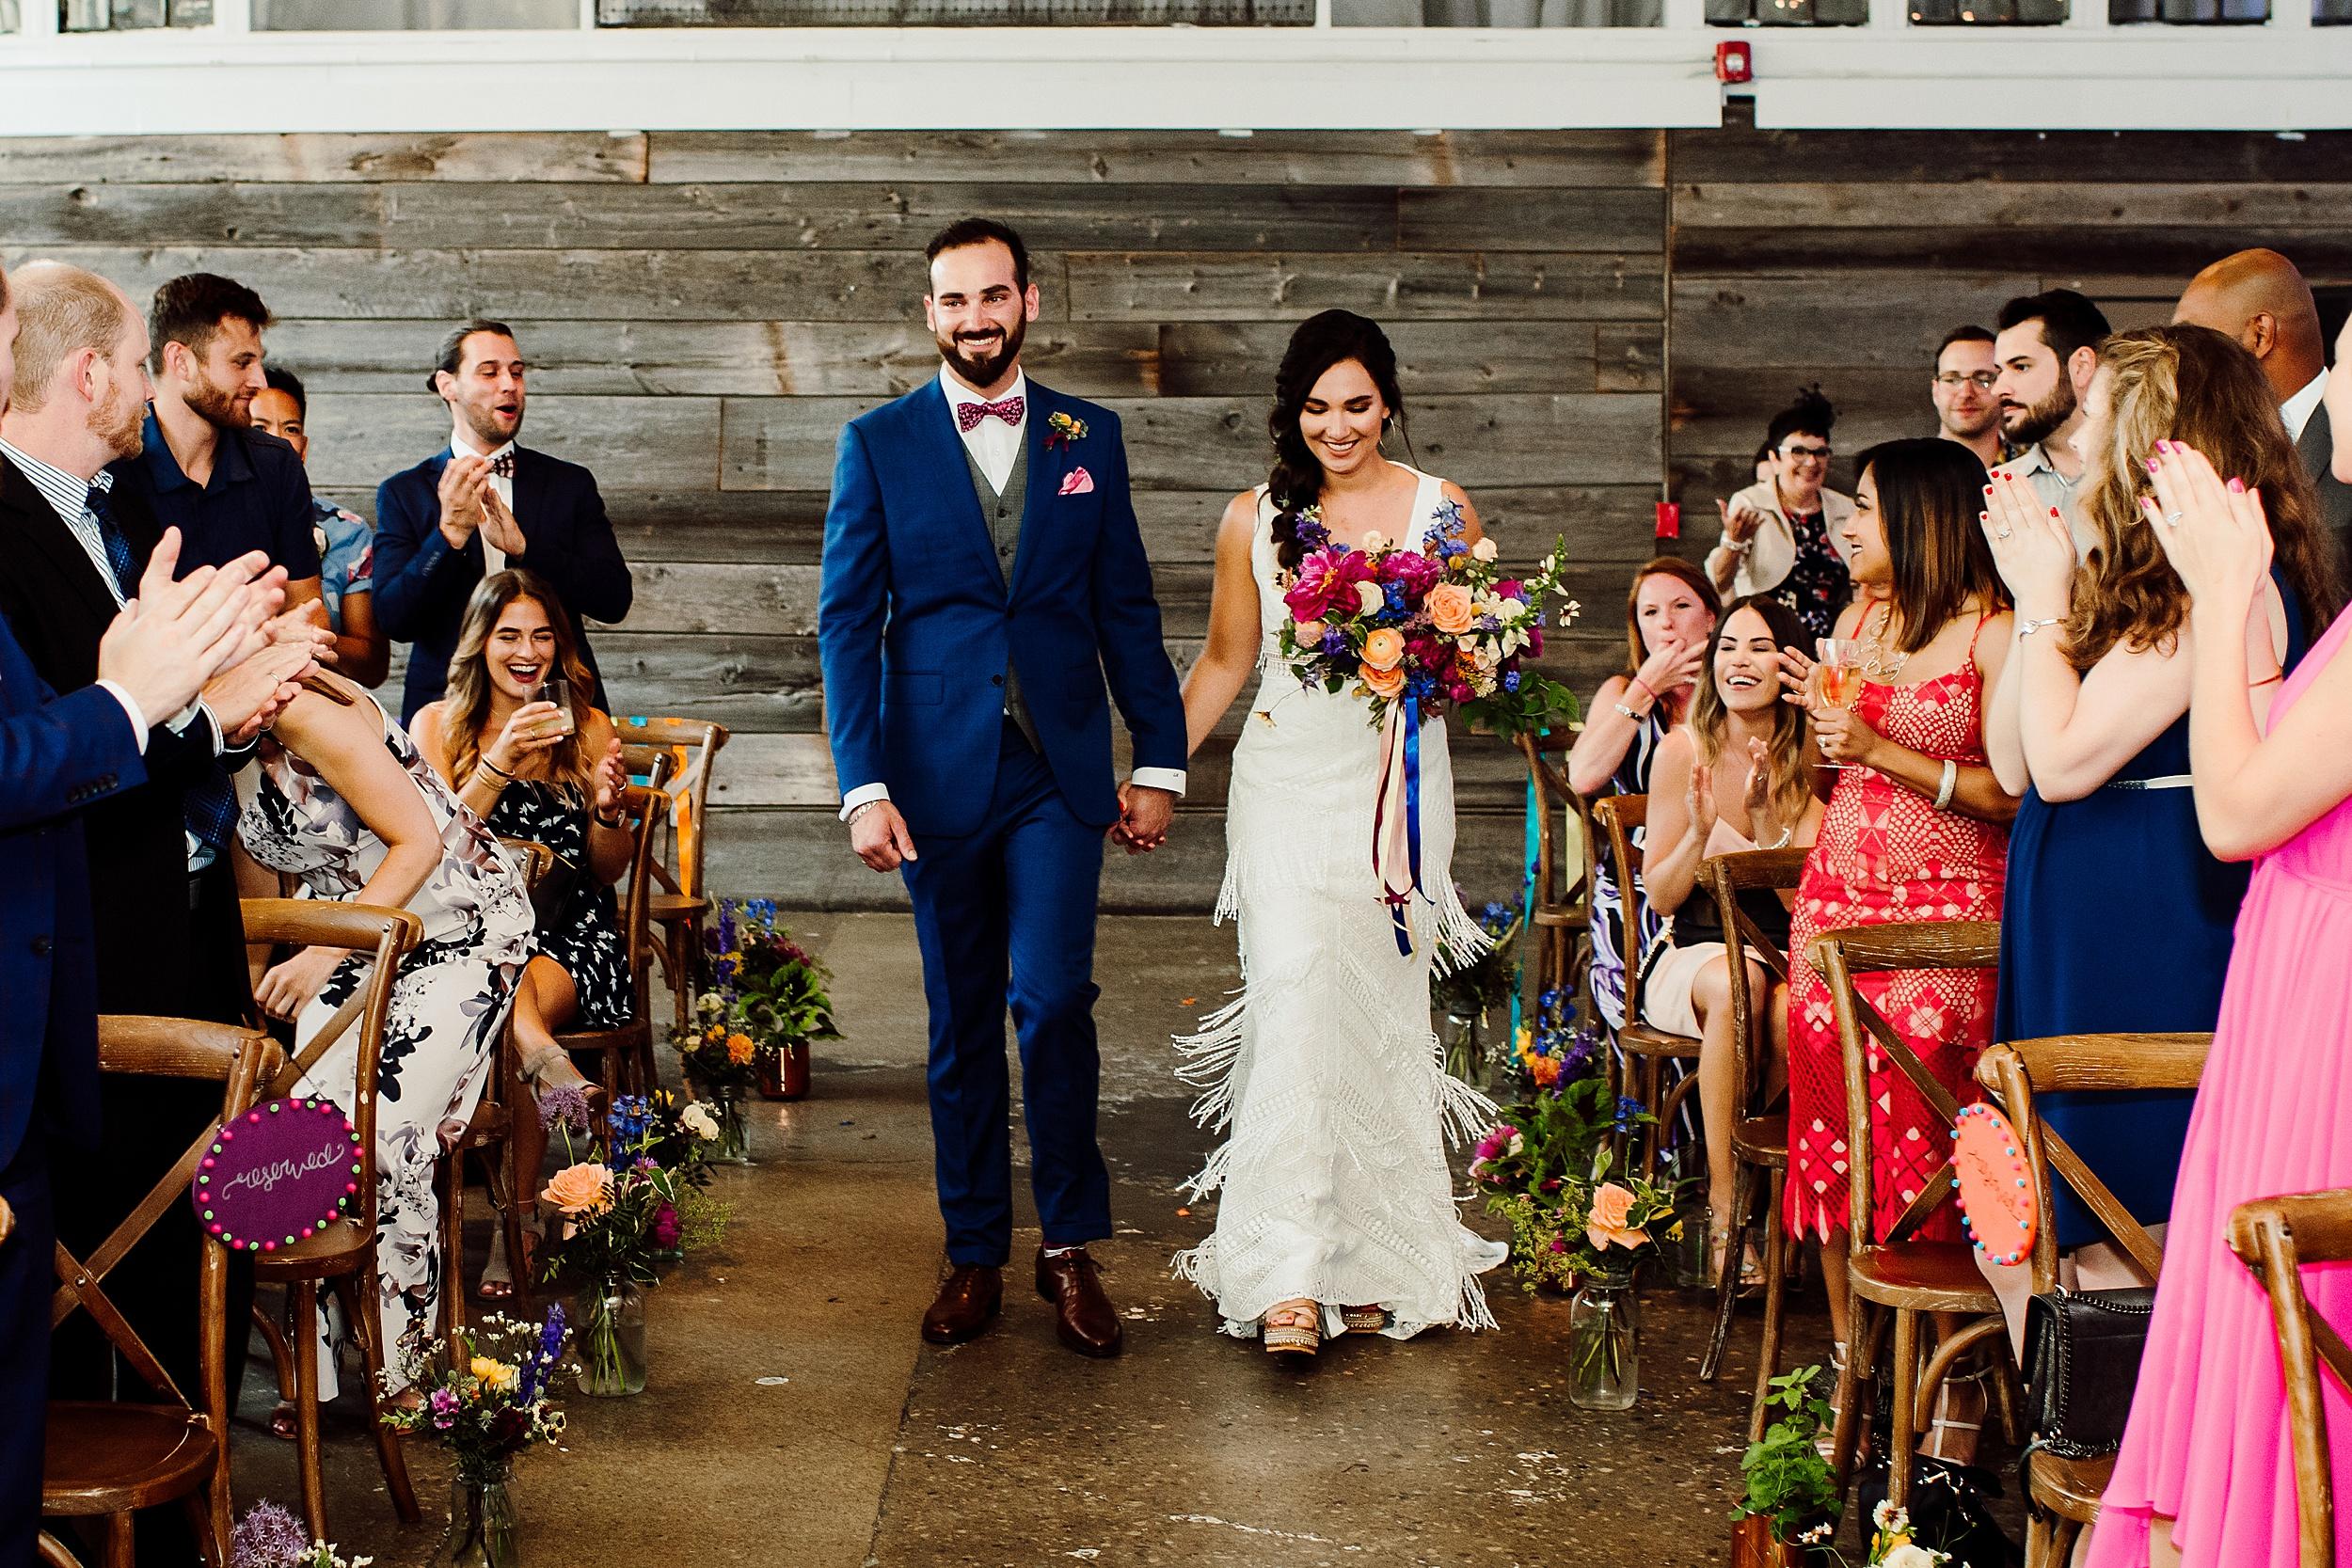 Airship-37-Berkeley-Events-Distillery-District-Wedding-Toronto-Wedding-Photographers_0060.jpg